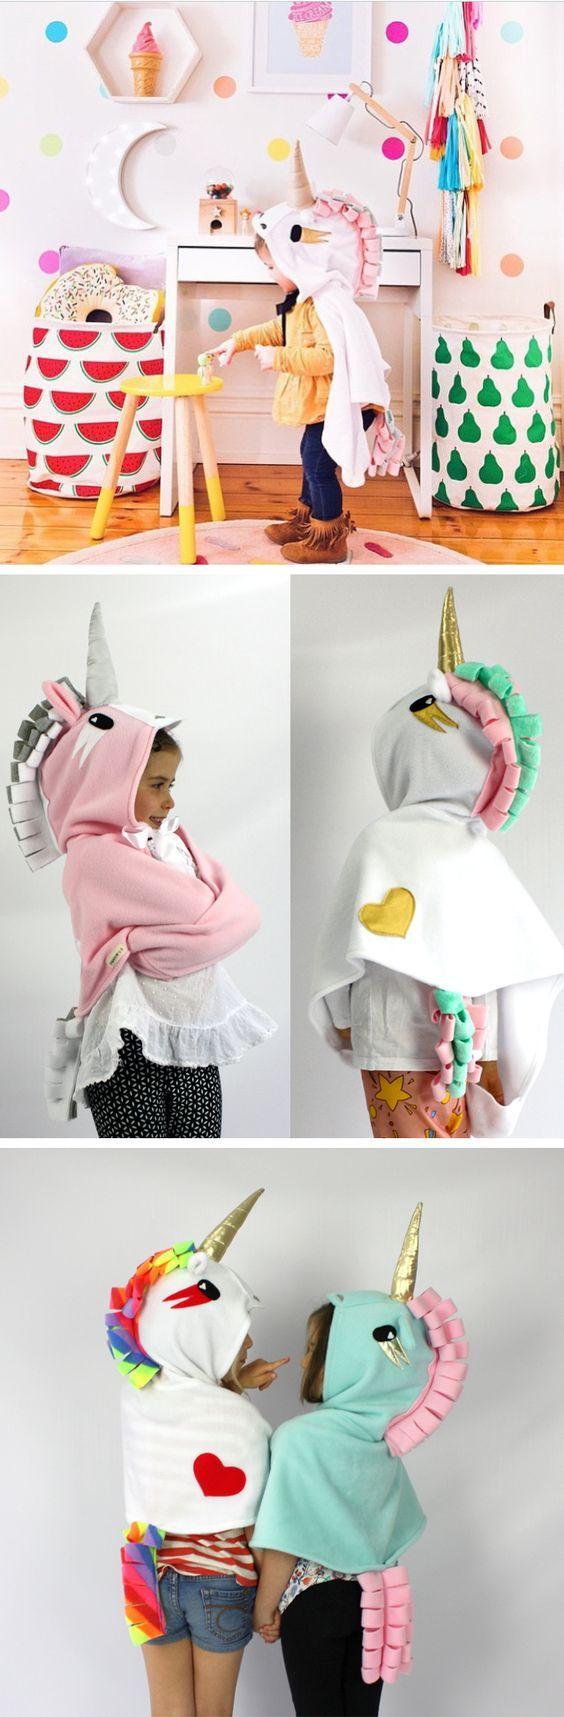 Unicorn Costume - Children's Handmade dress-up for imaginative play